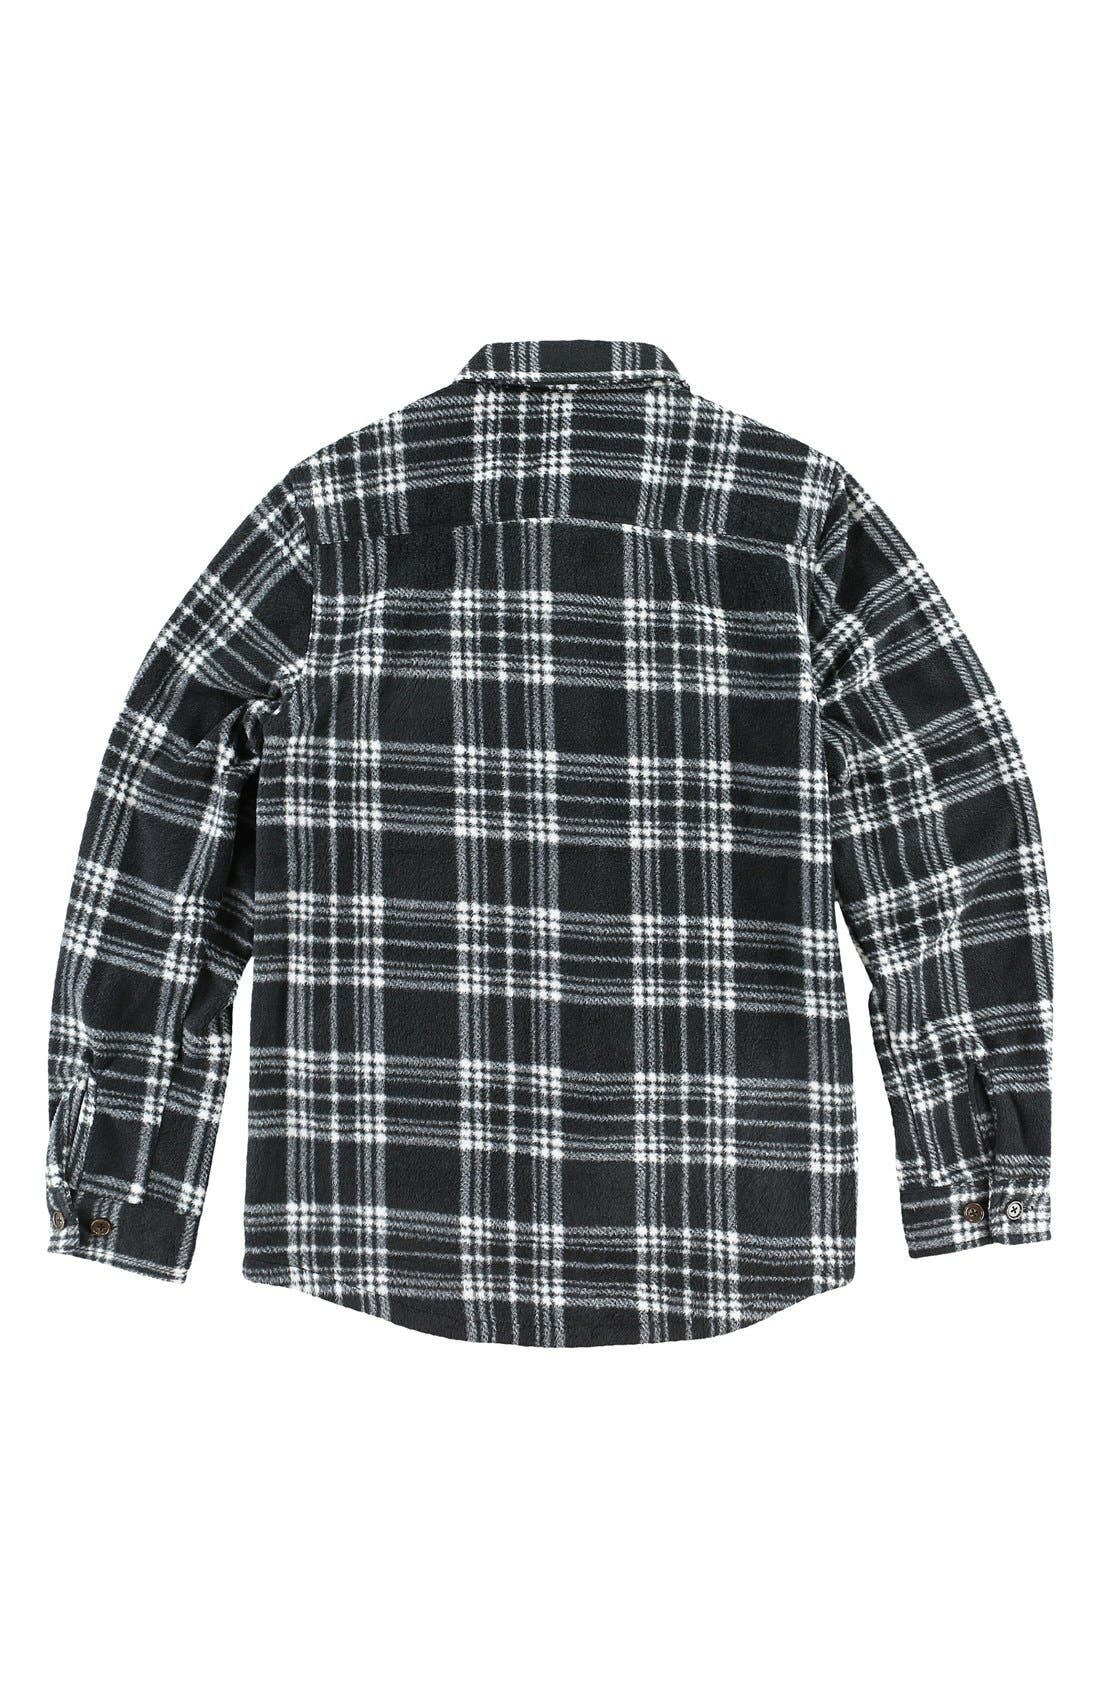 'Glacier' Check Long Sleeve Fleece Shirt,                             Alternate thumbnail 2, color,                             001